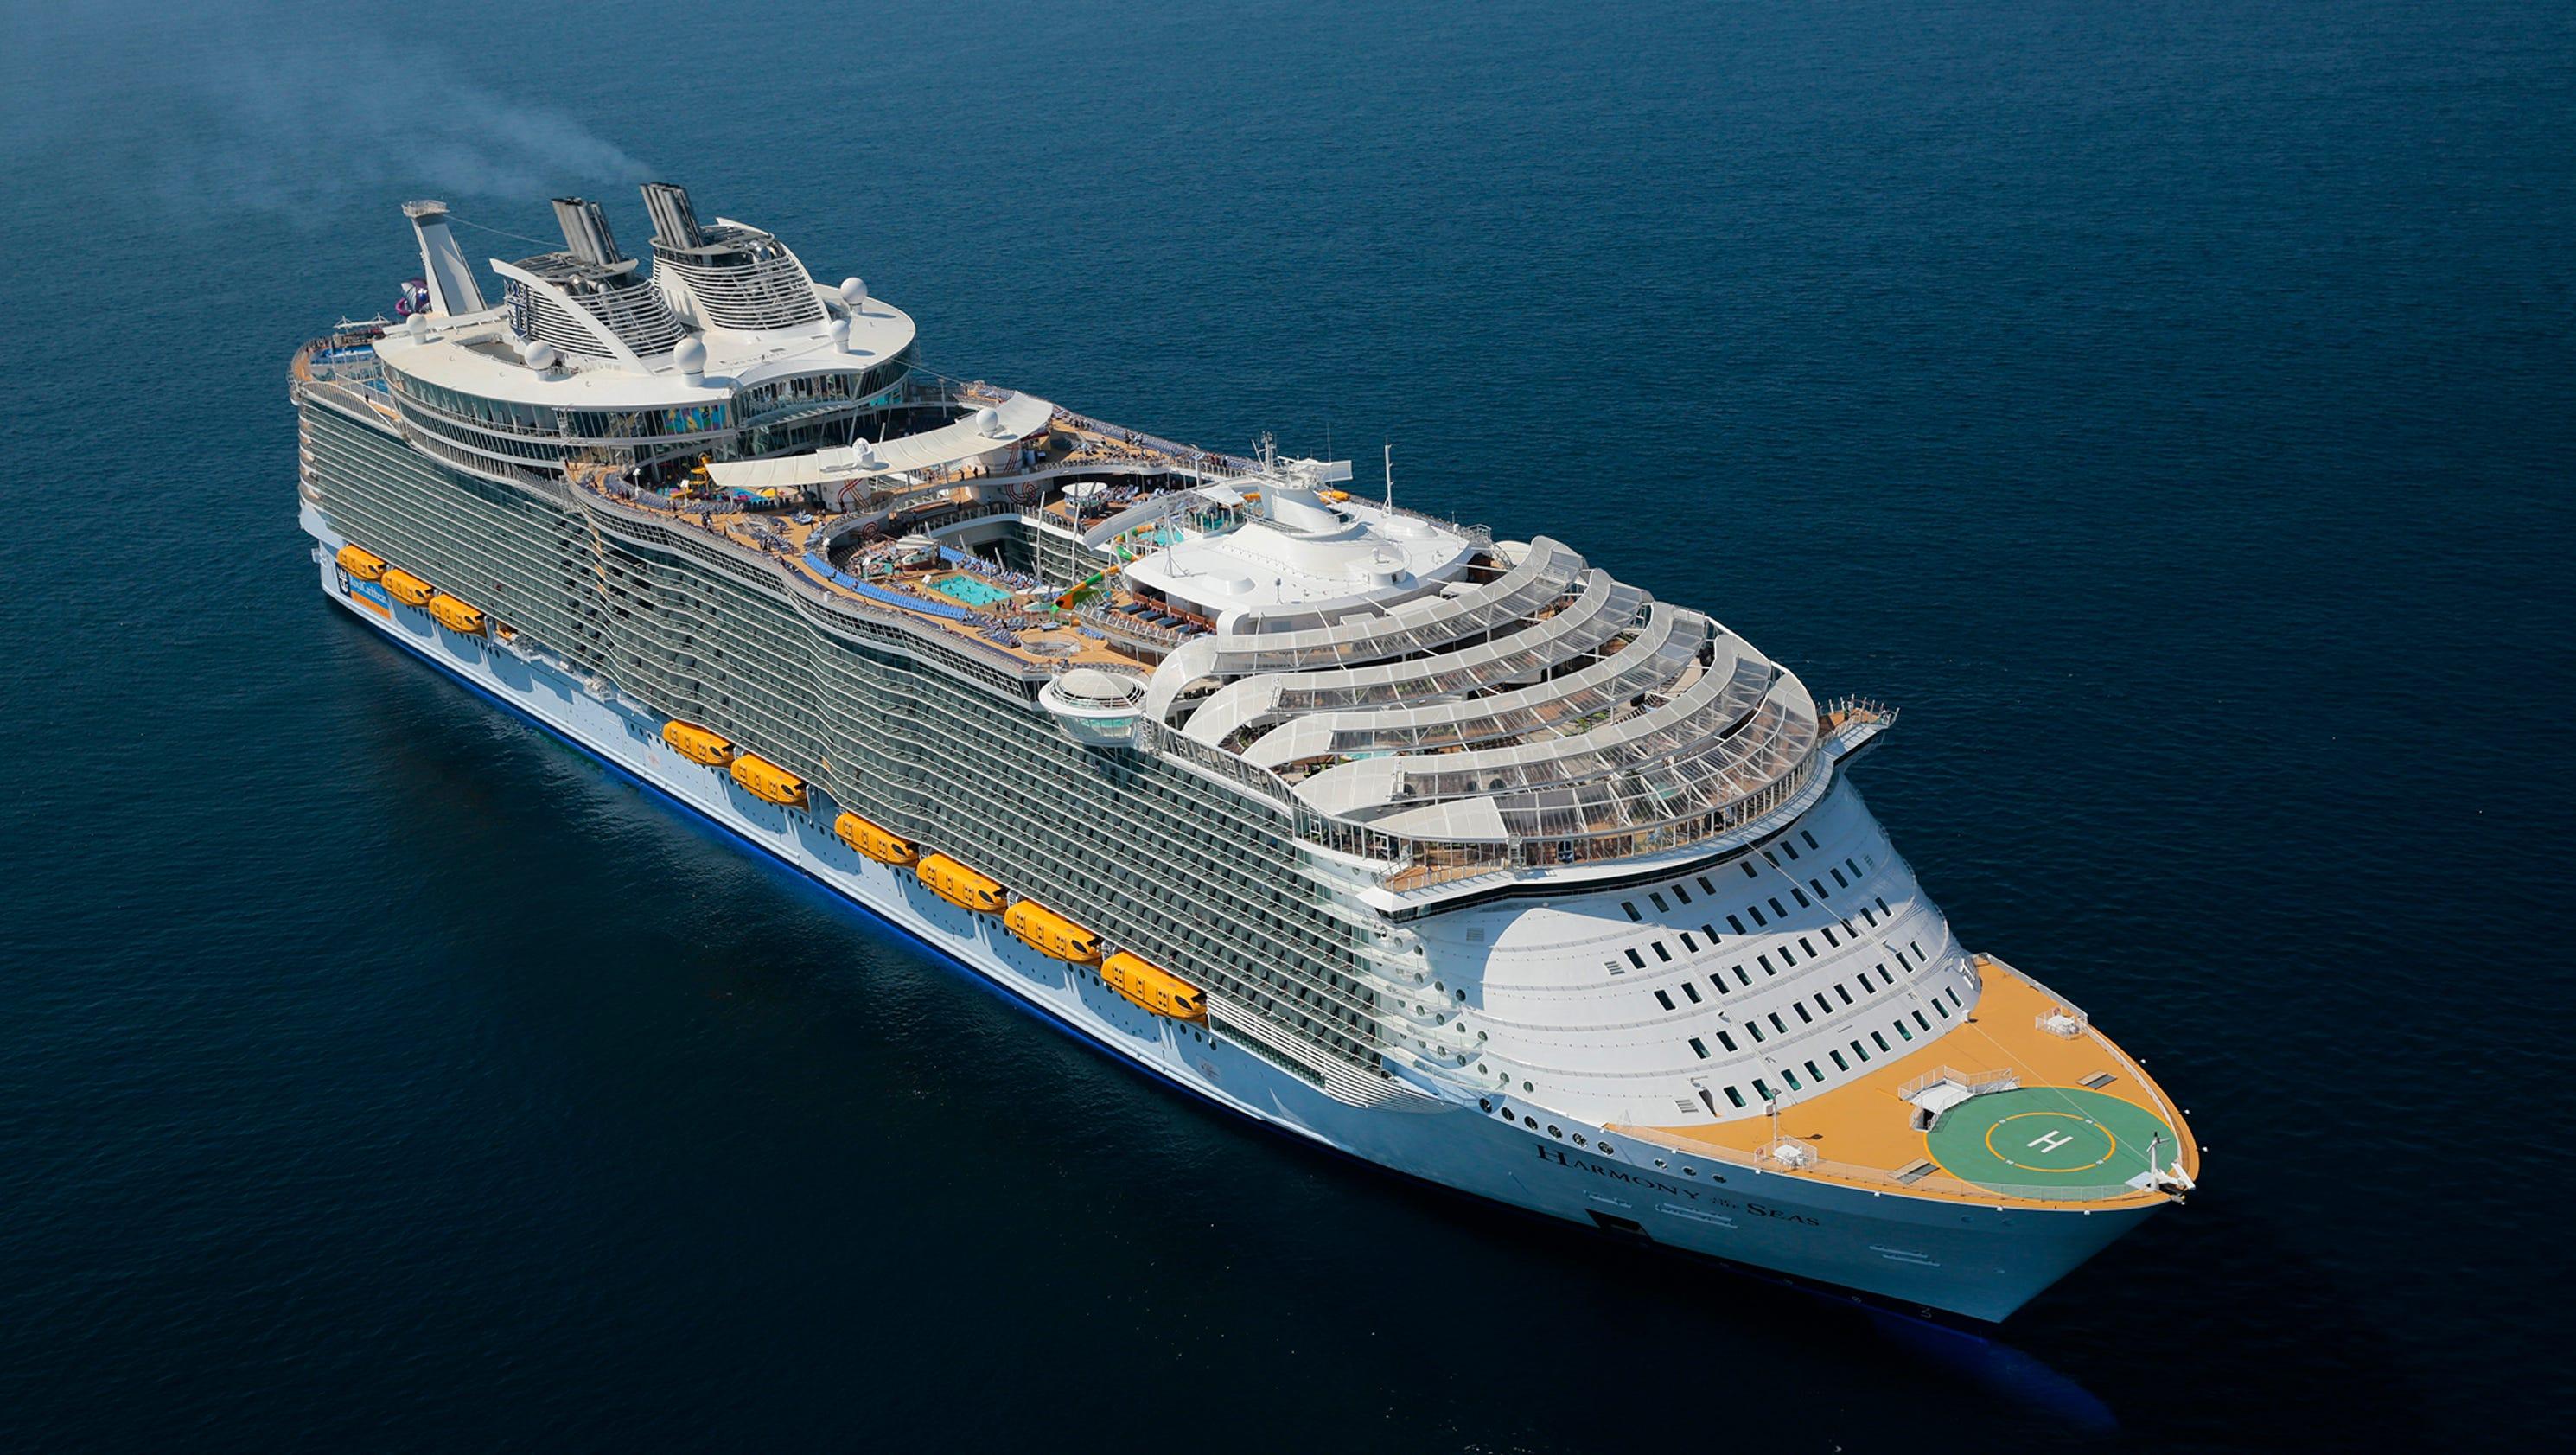 Royal Caribbean S Symphony Of The Seas Passes Sea Trials